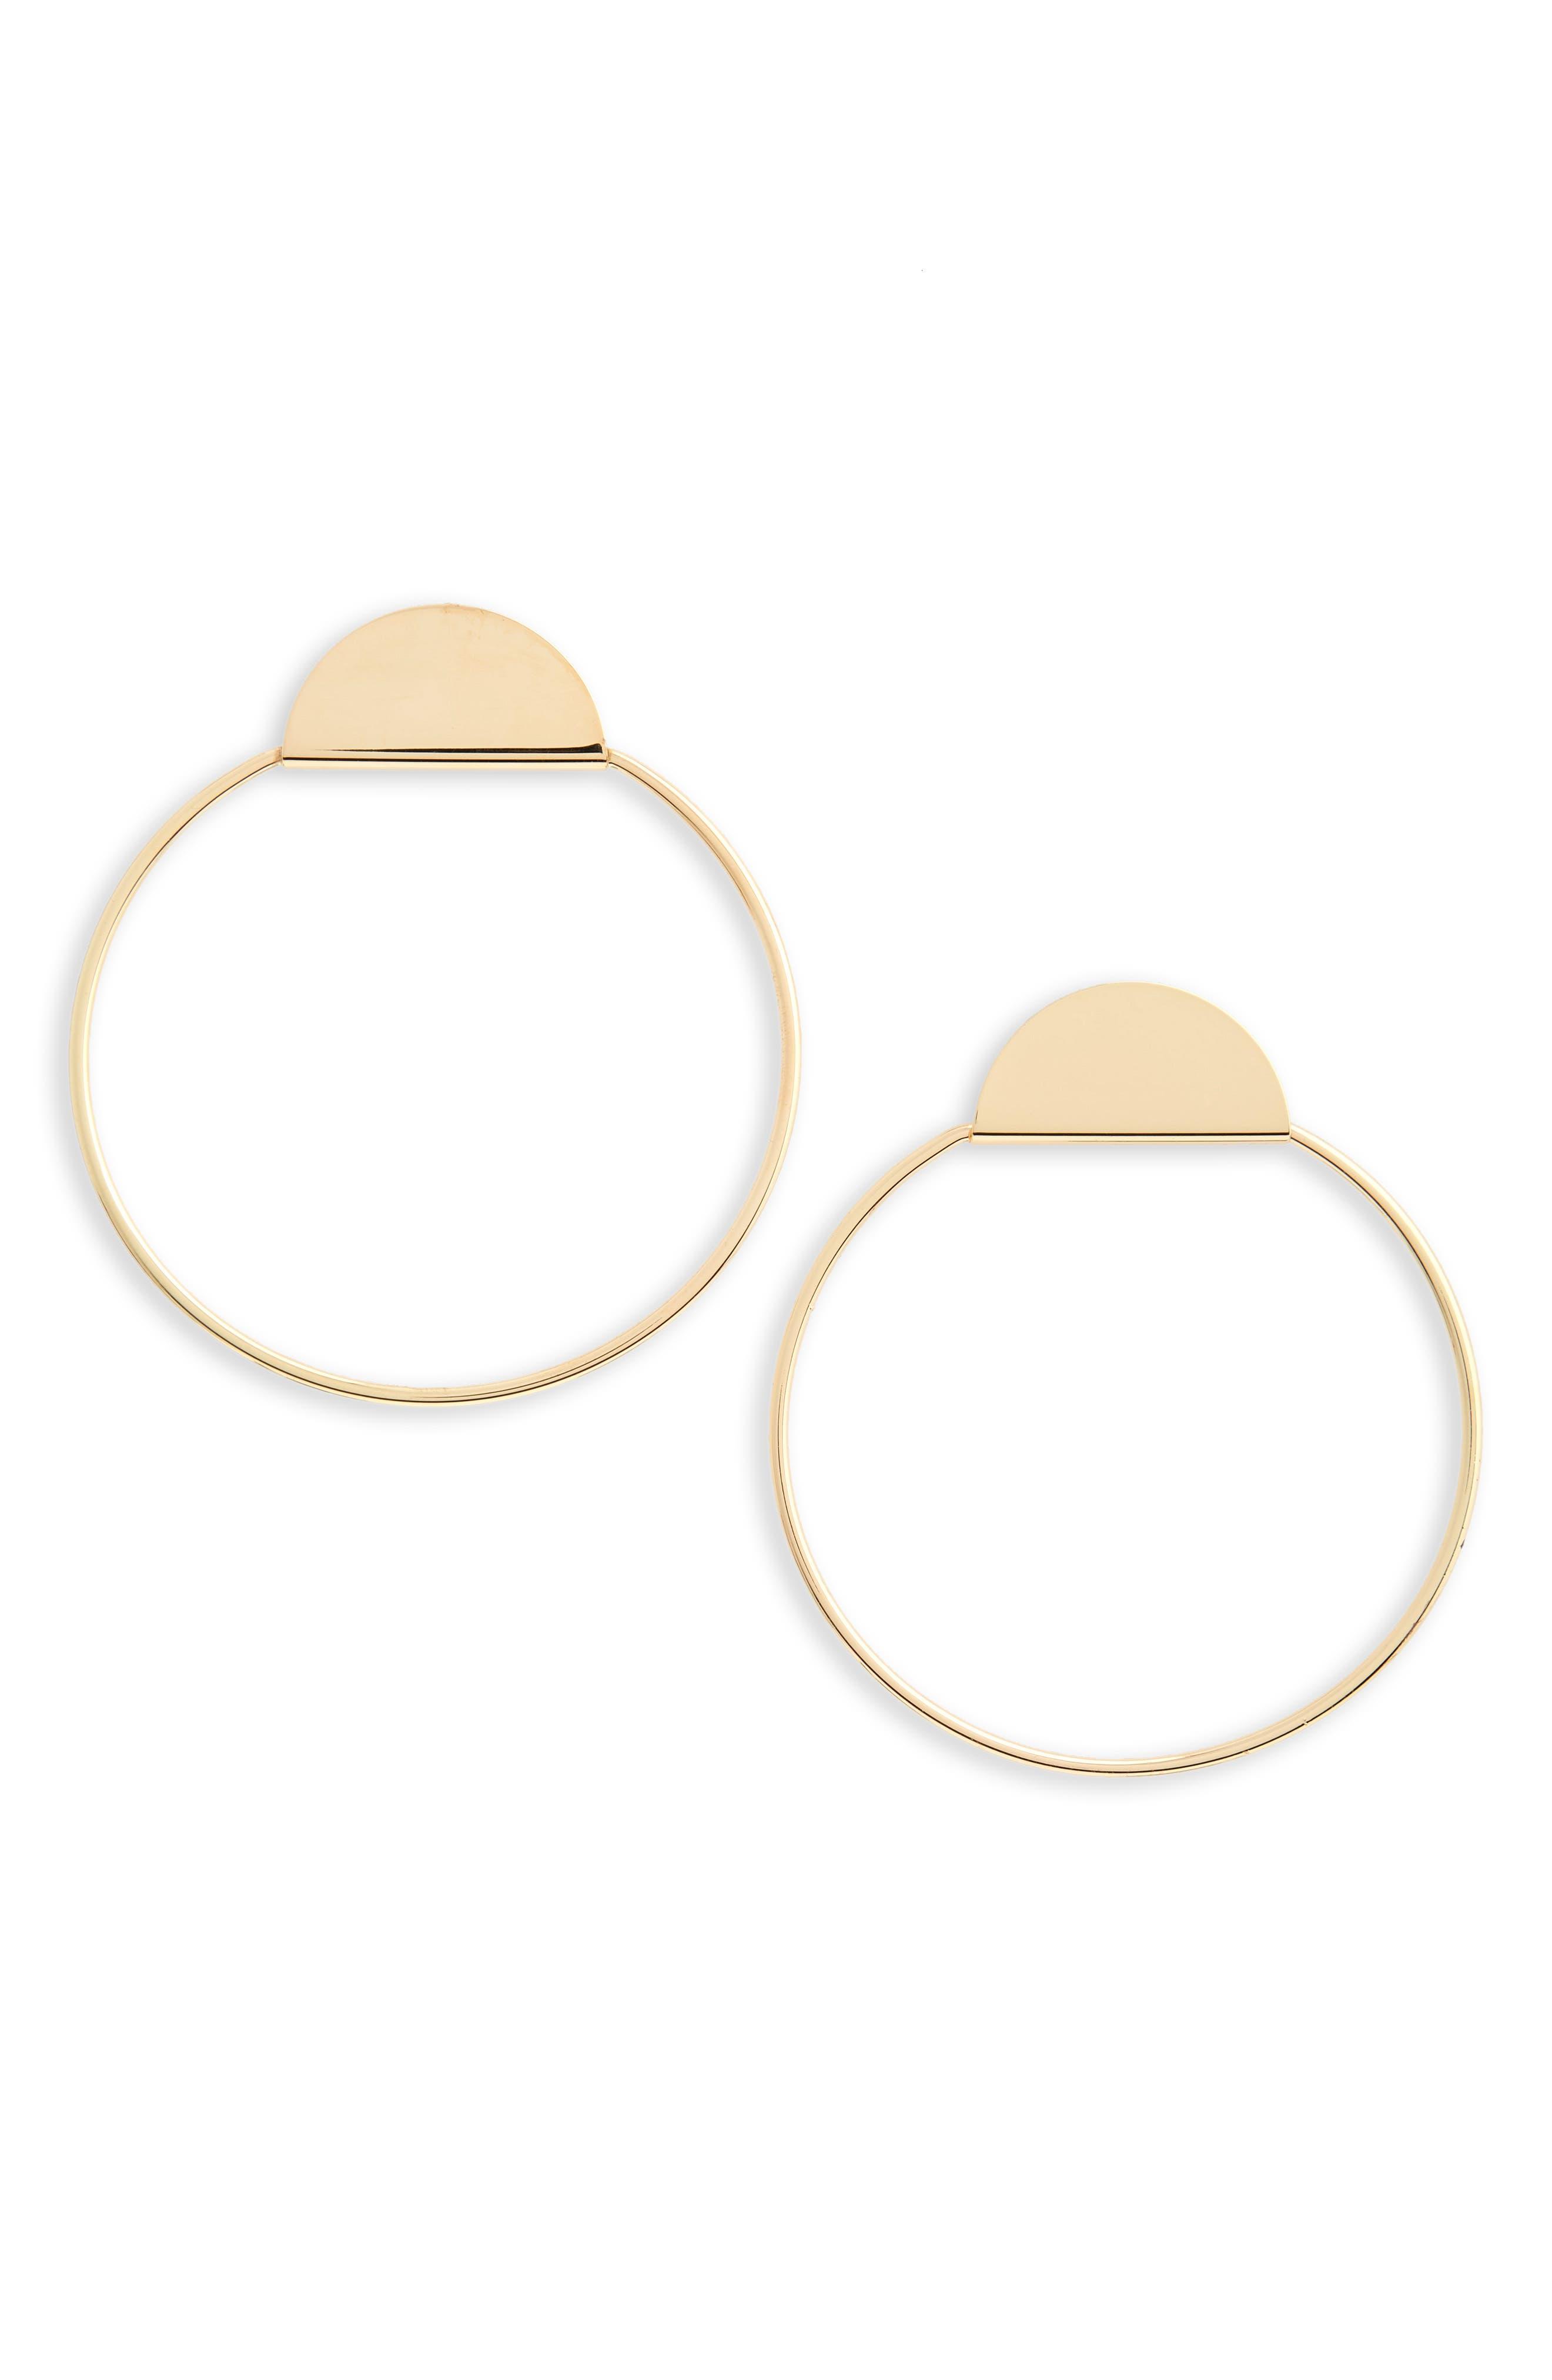 Half-Circle & Hoop Earrings,                             Main thumbnail 1, color,                             Gold